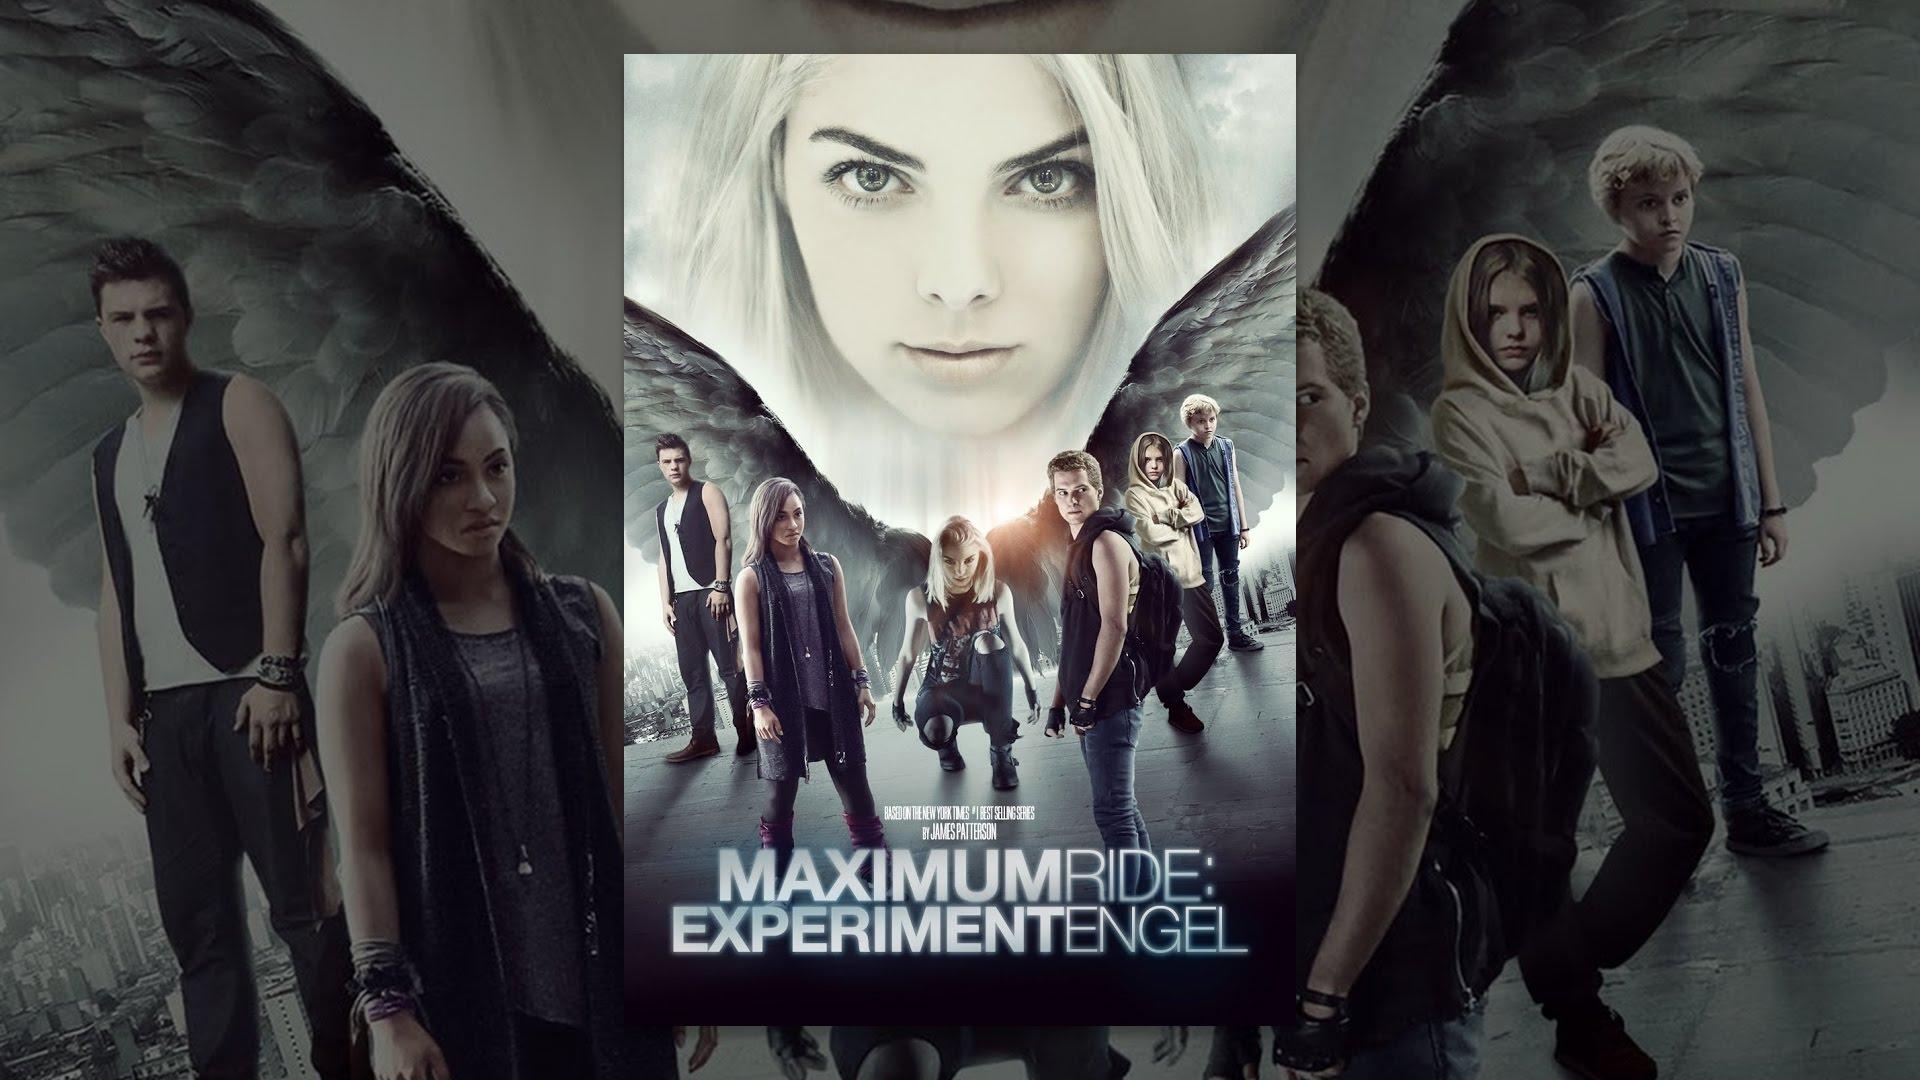 maximum ride experiment engel